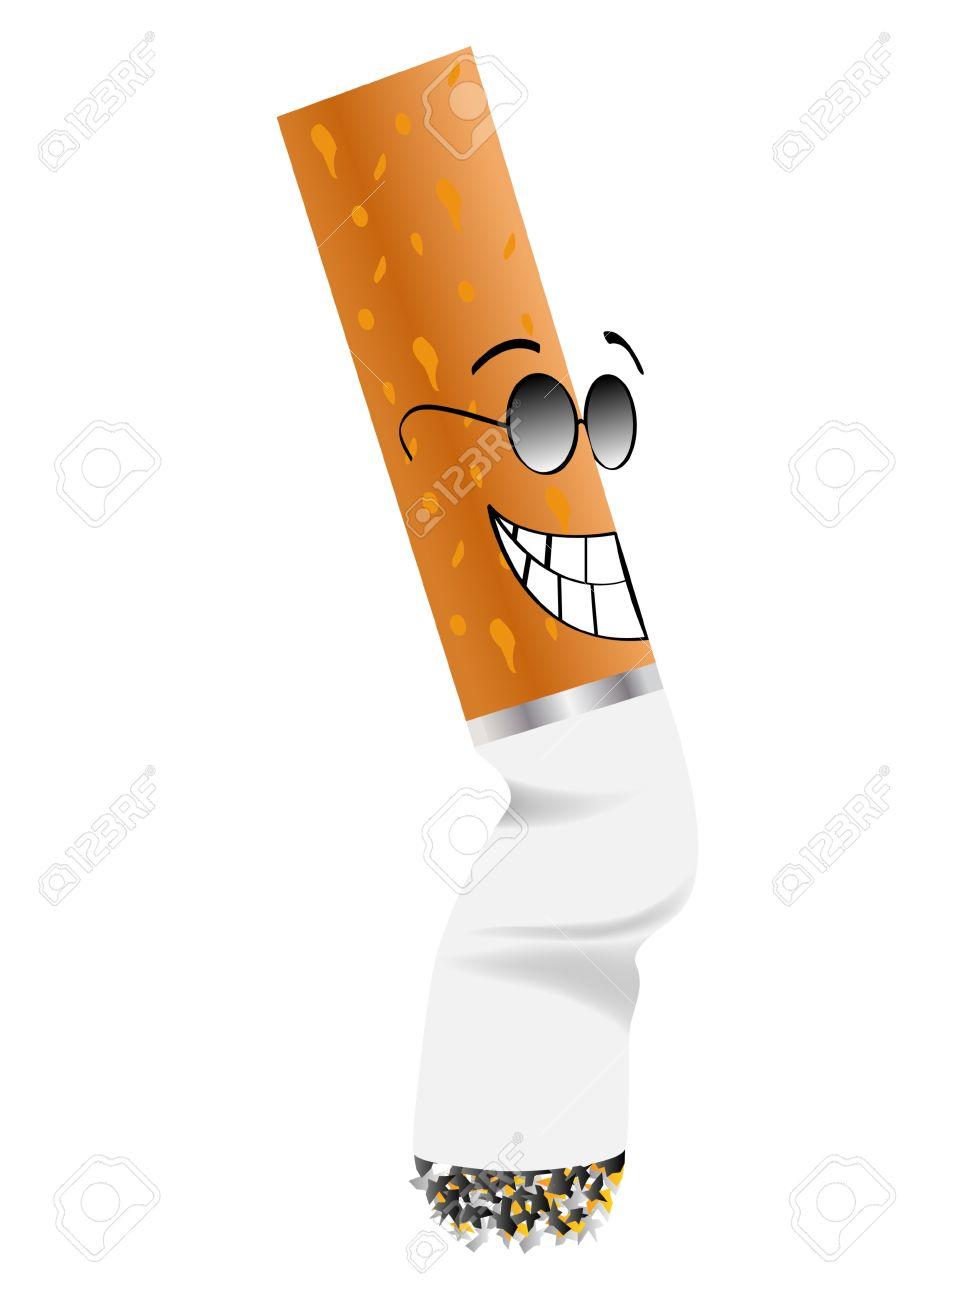 Cigarette Butt Vector Illustration Royalty Free Cliparts, Vectors.